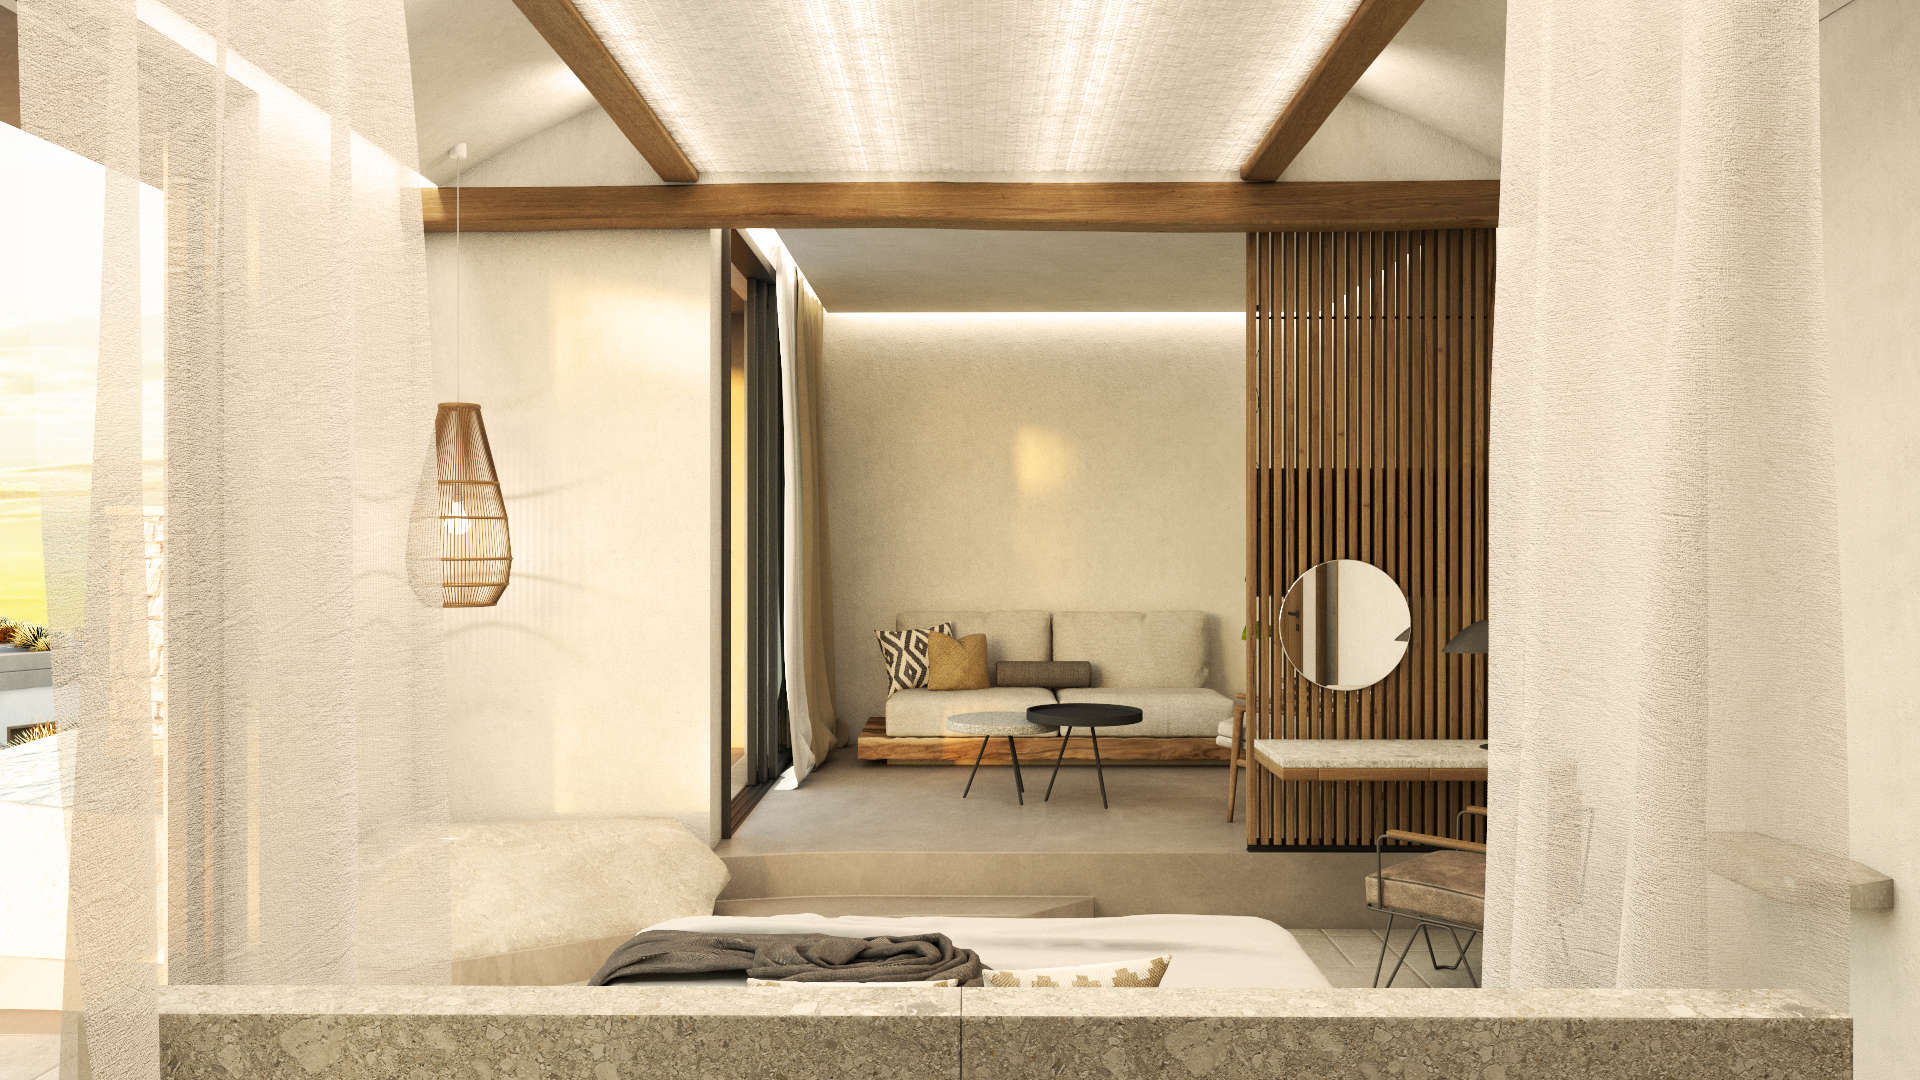 Interior design, Luxury suite, bed, living room and desk. Διακόσμηση, Πολυτελής σουίτα. Κρεβάτι, καθιστικό και γραφείο.